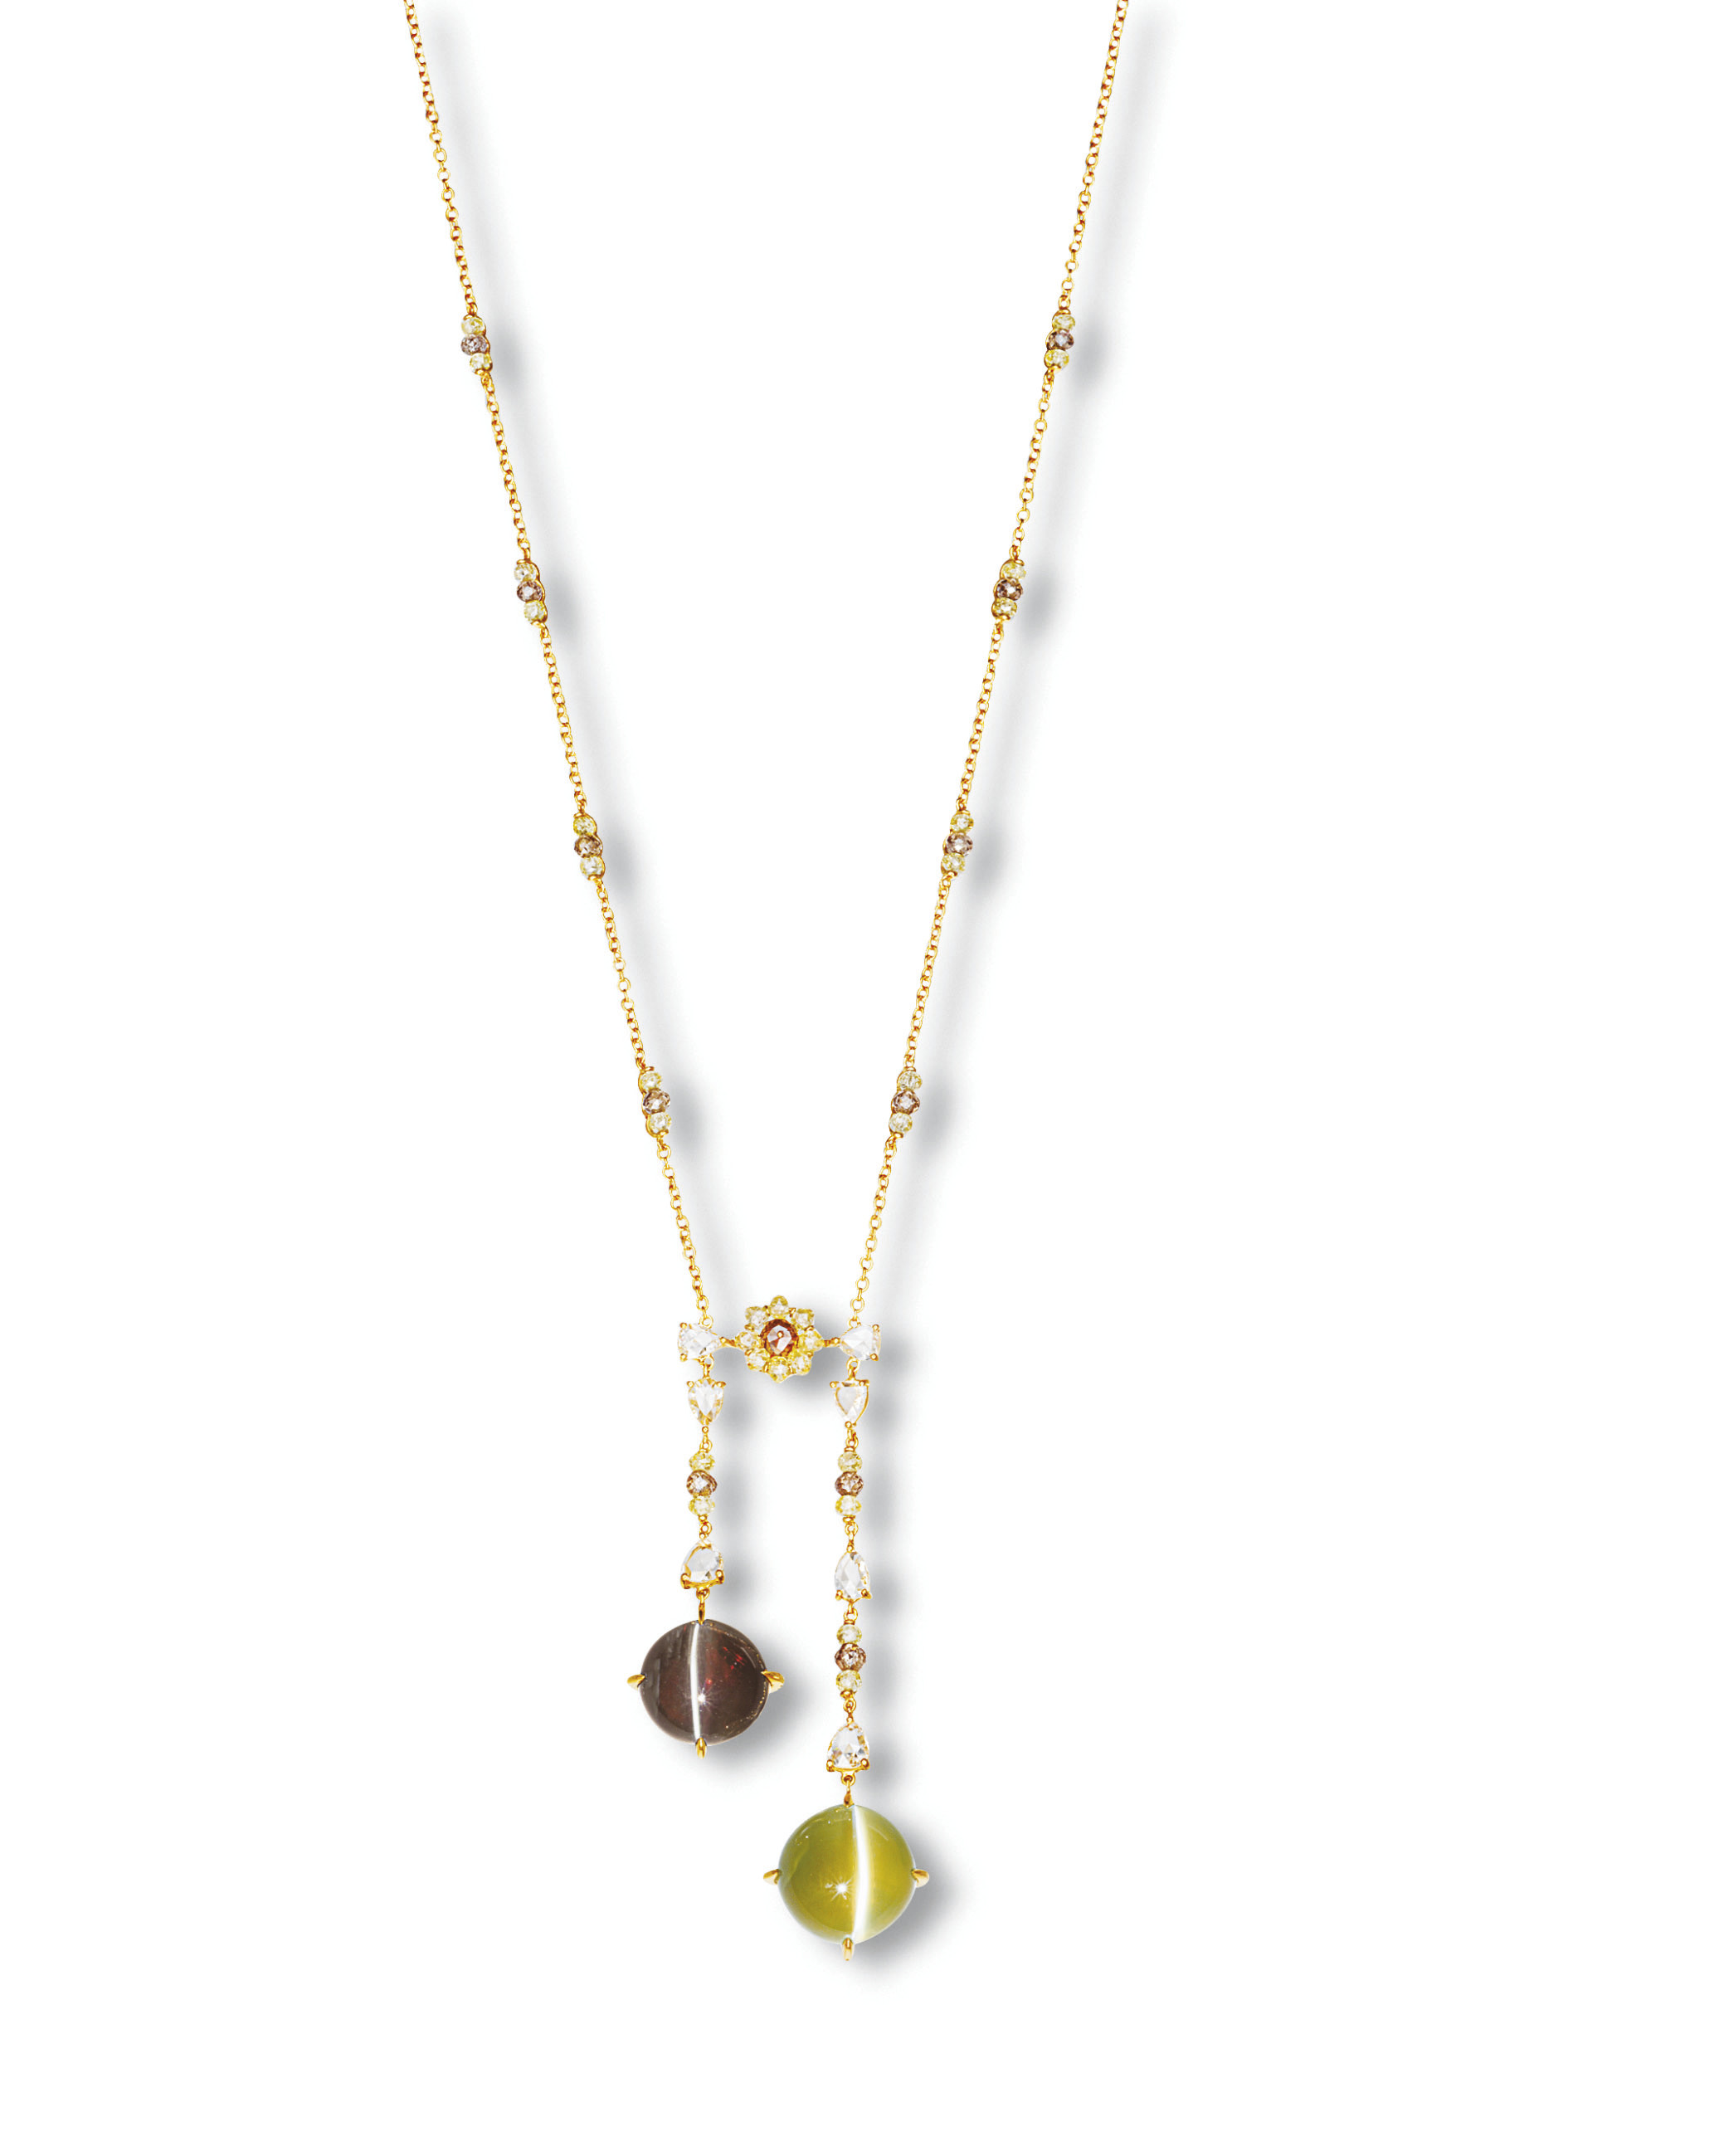 Cats Eye Jewelry : jewelry, CAT'S, ALEXANDRITE, CHRYSOBERYL, PENDENT, NECKLACE